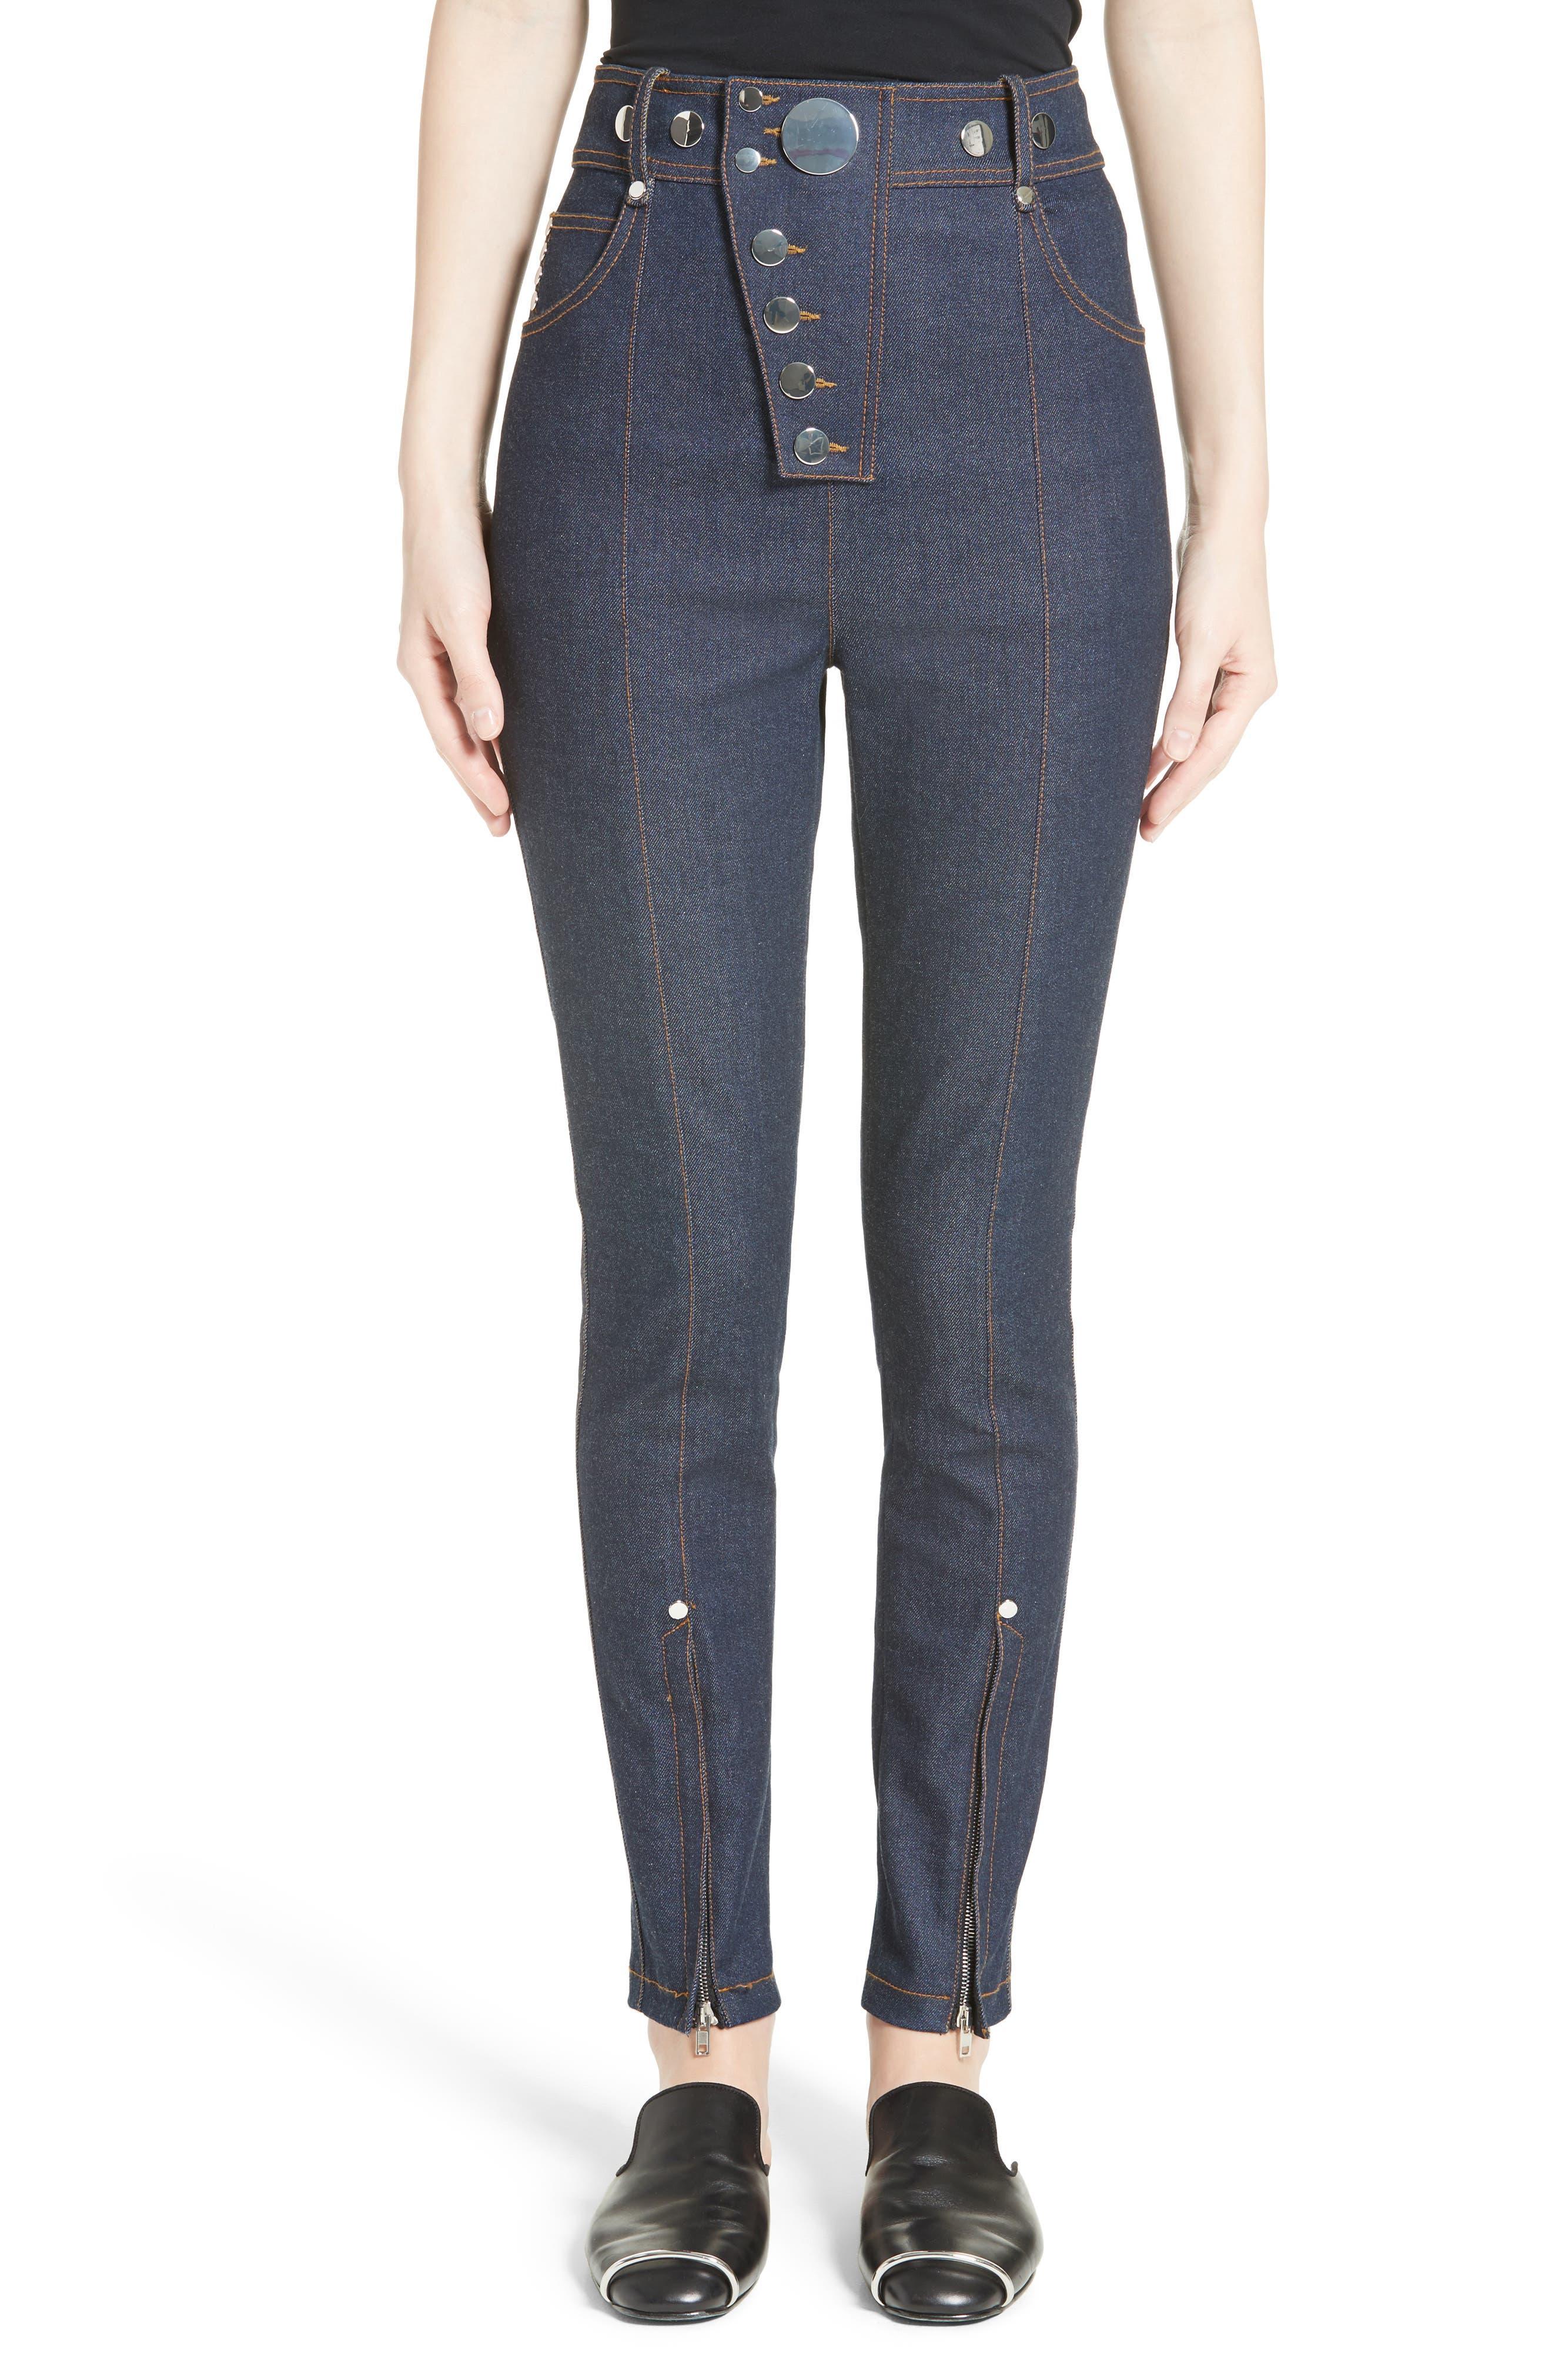 ALEXANDER WANG Snap High Waist Skinny Jeans